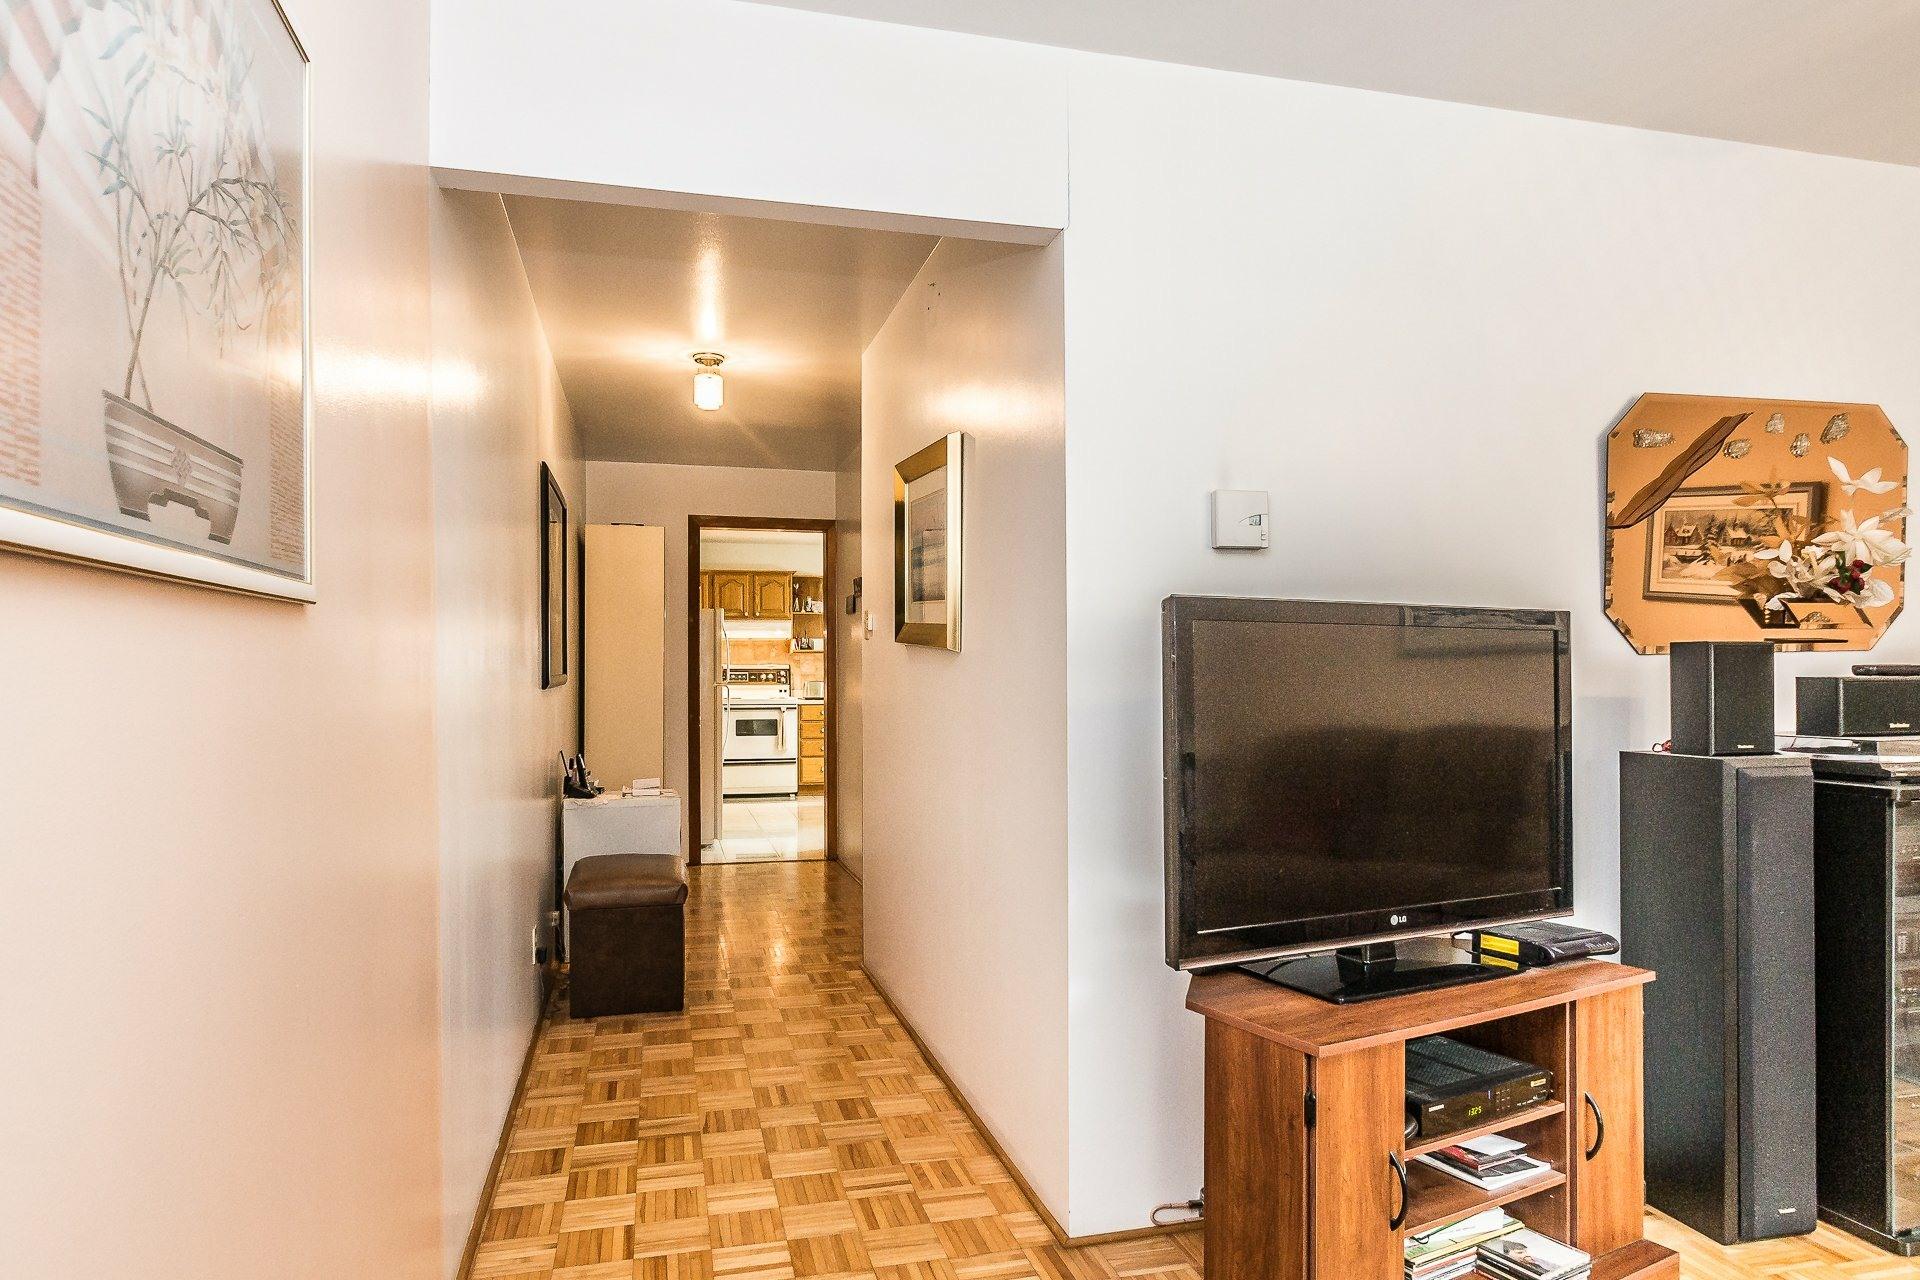 image 13 - Duplex En venta Montréal Lachine  - 3 habitaciones